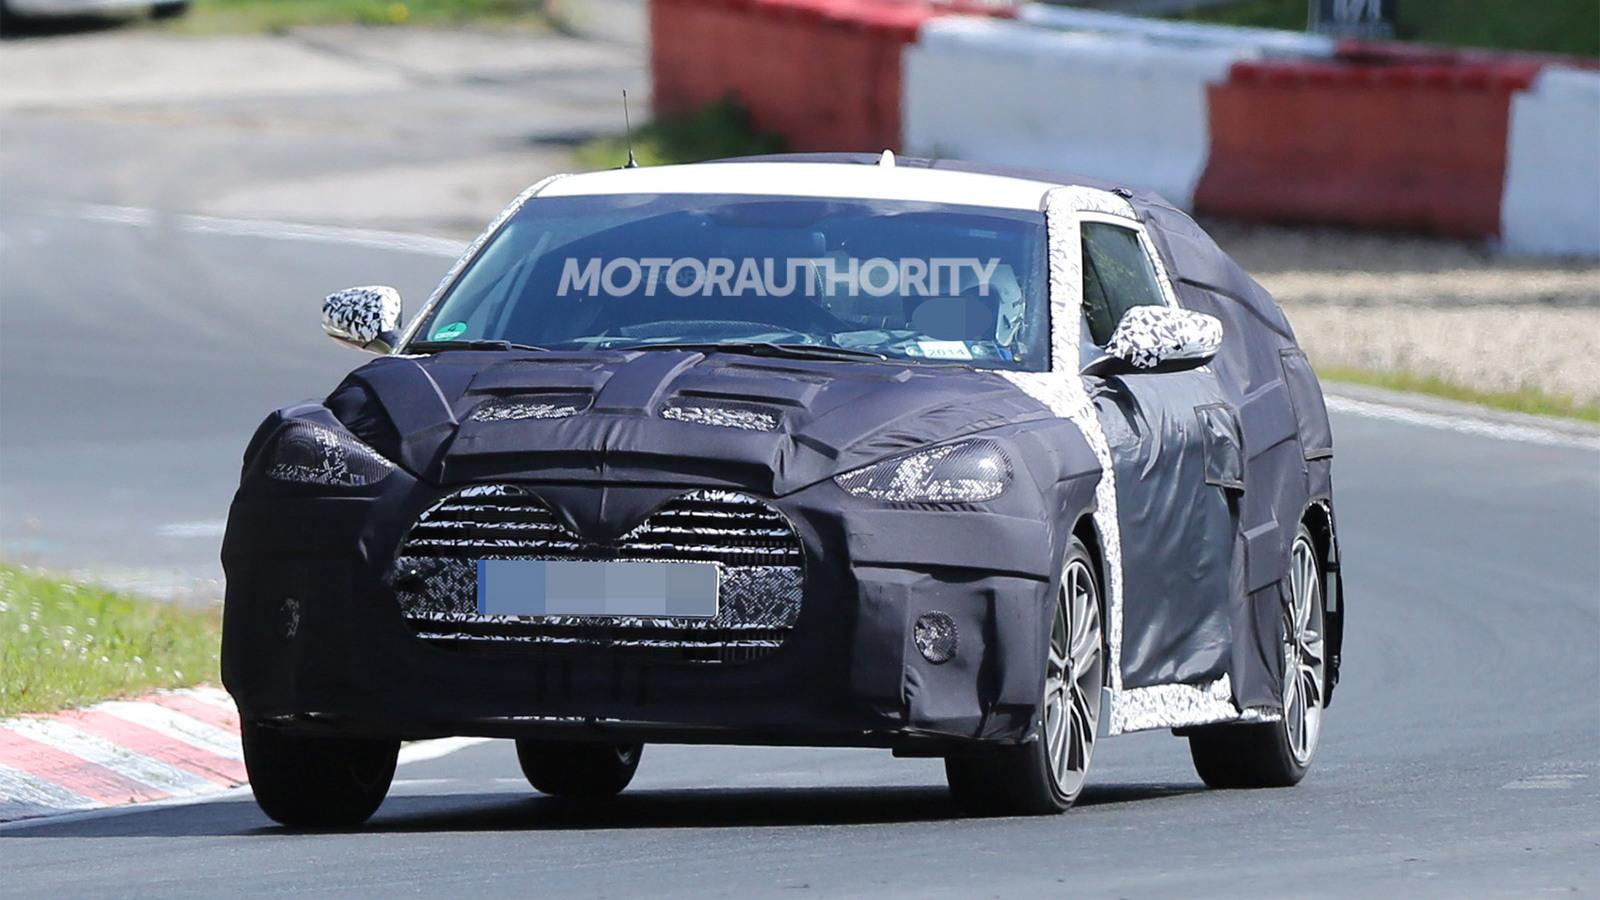 2016 Hyundai Veloster facelift spy shots